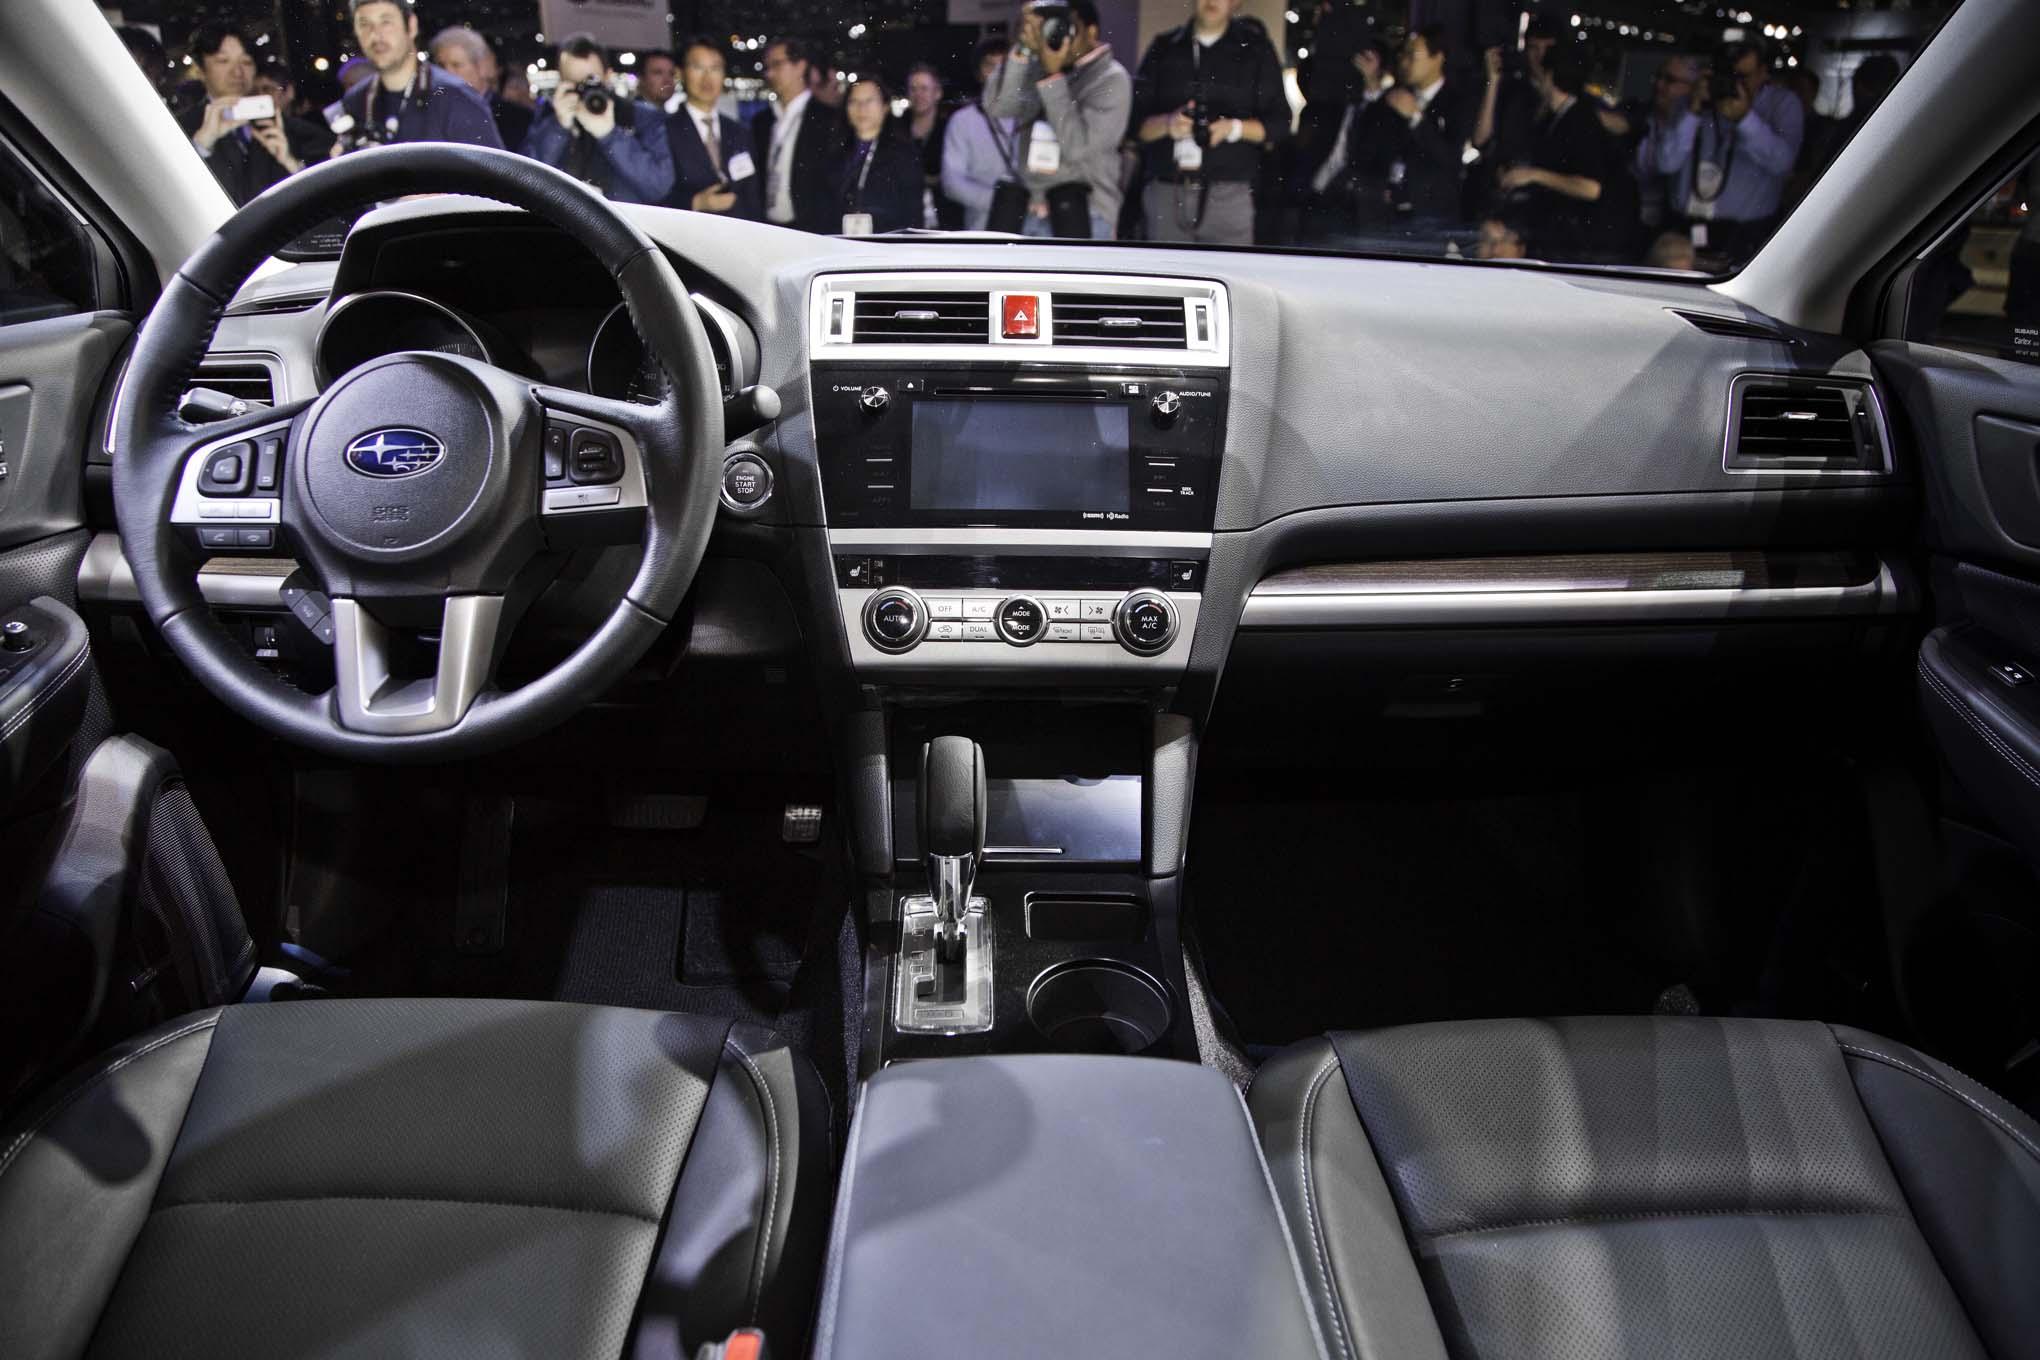 2015 subaru legacy debuts at 2014 chicago auto show - automobile